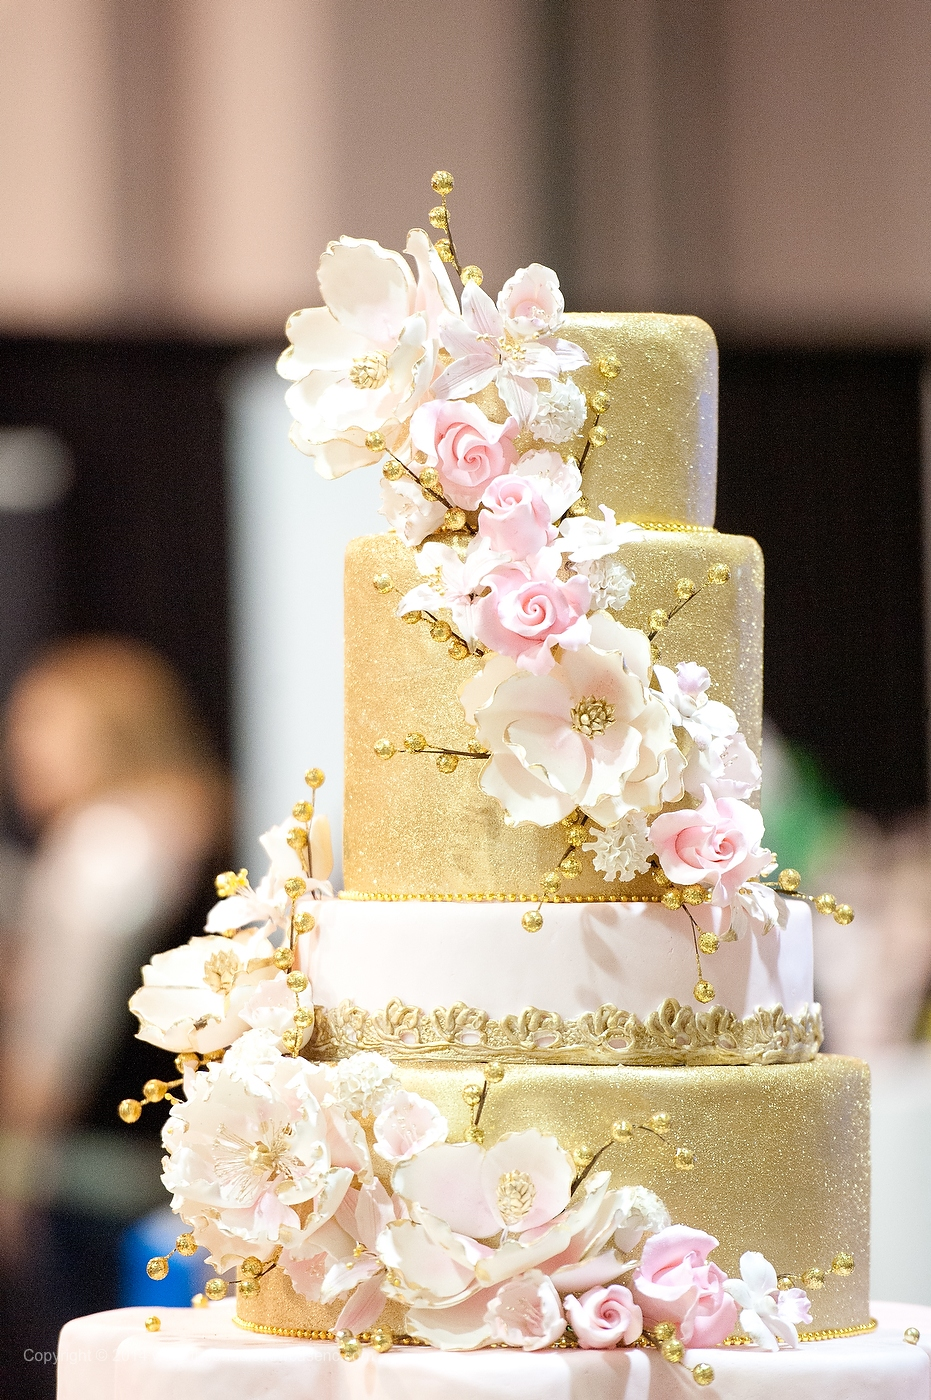 Charlotte NC Bridal Show - The Bridal Showcase — The Carolinas ...